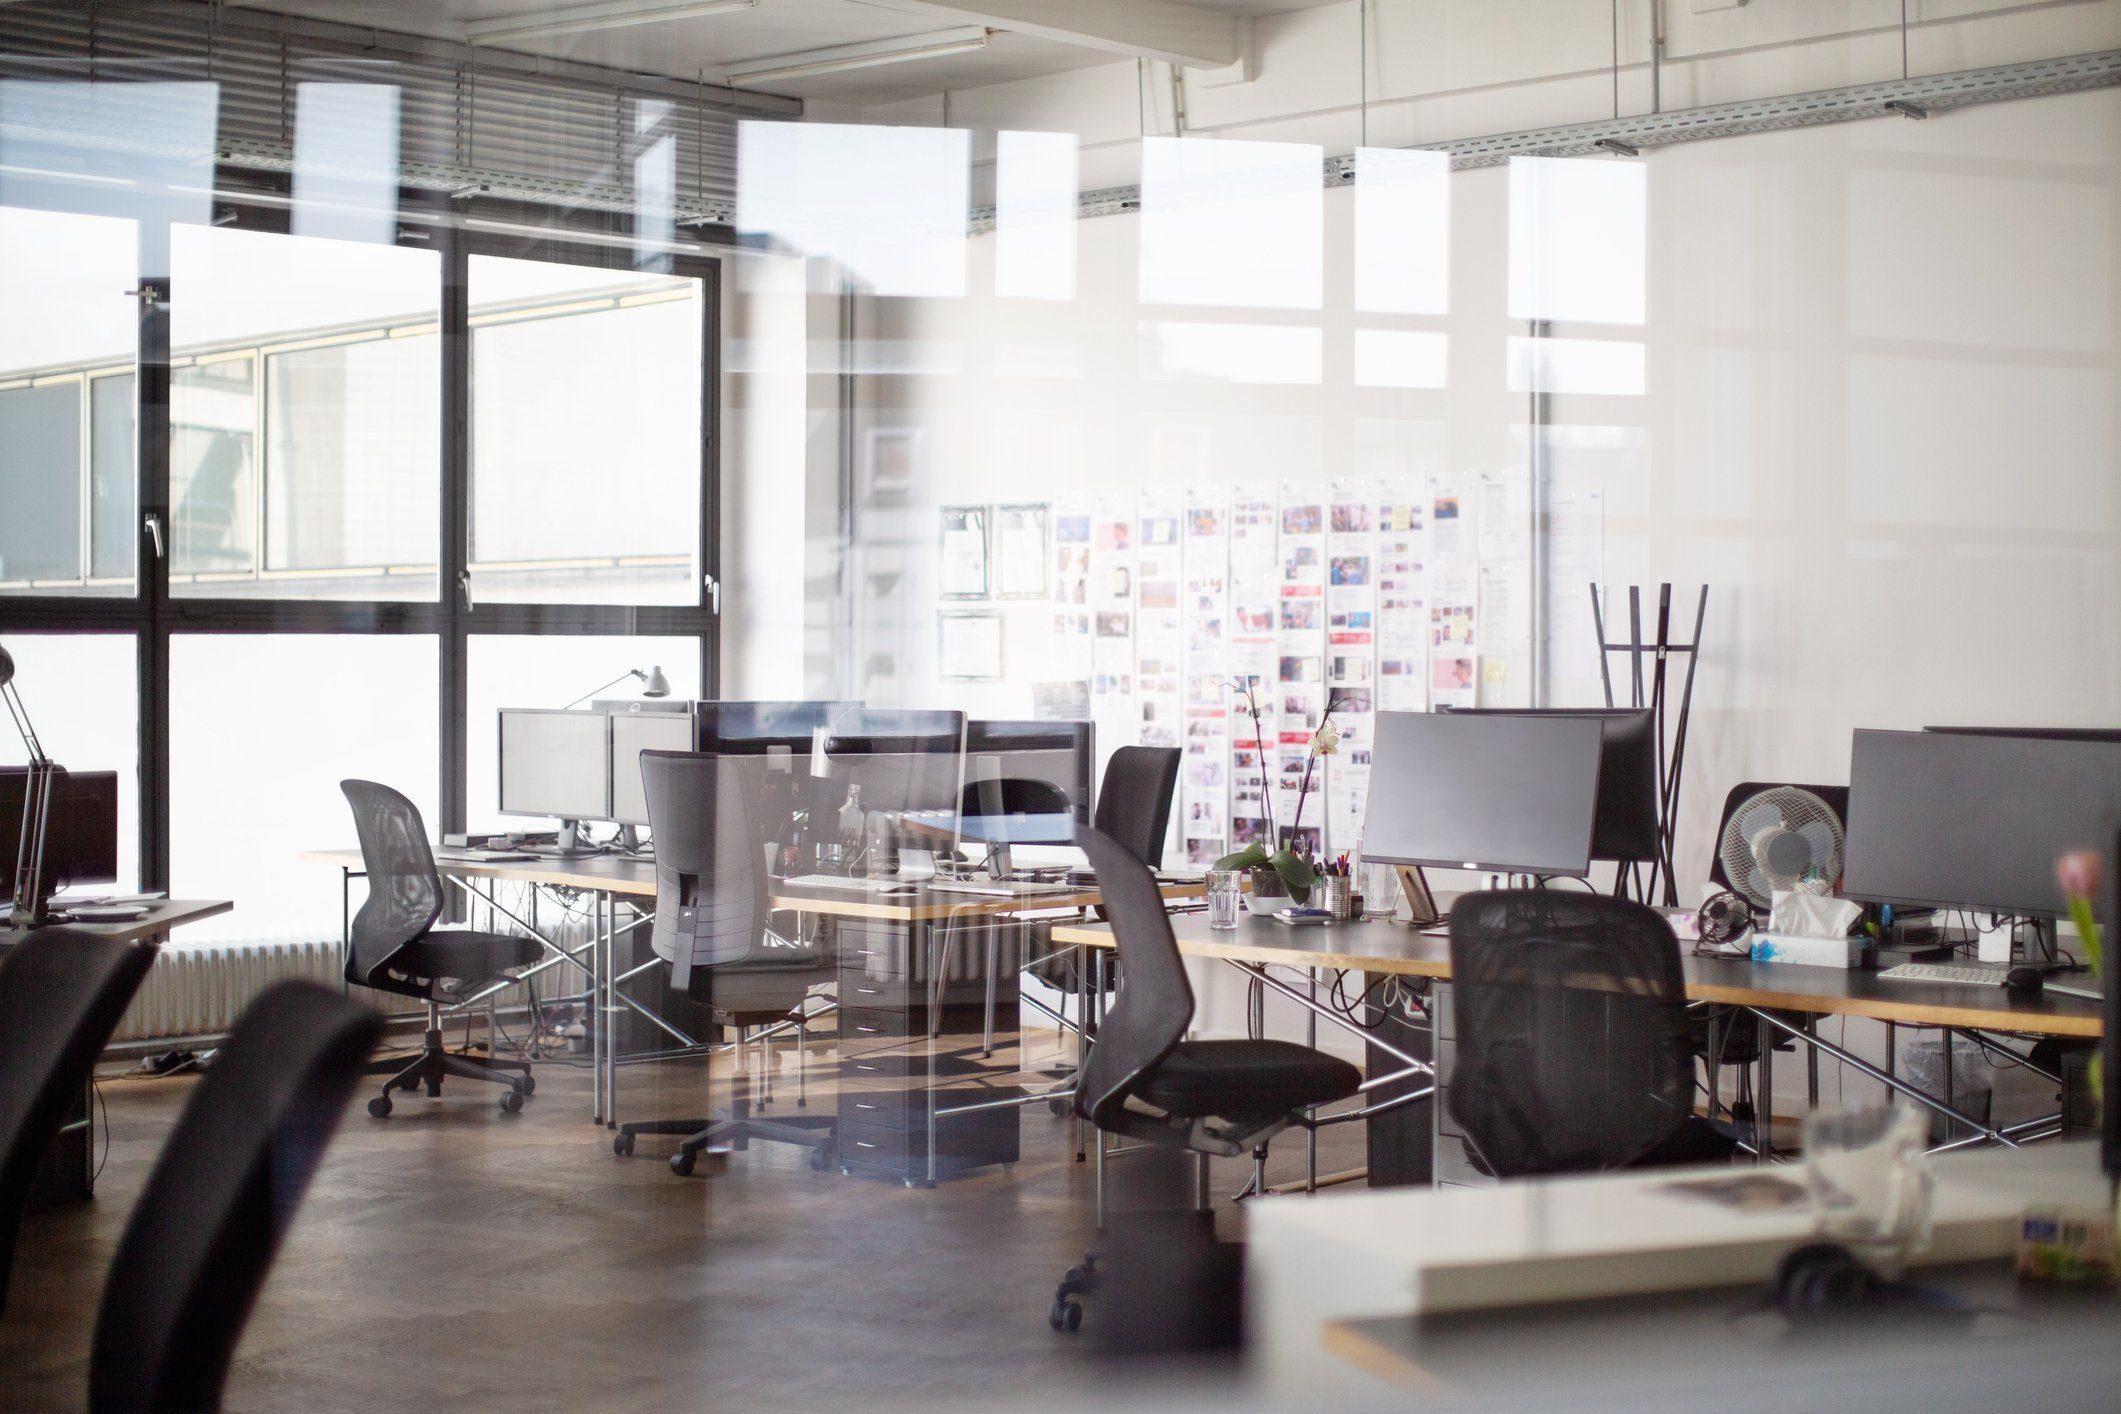 Interior of open office